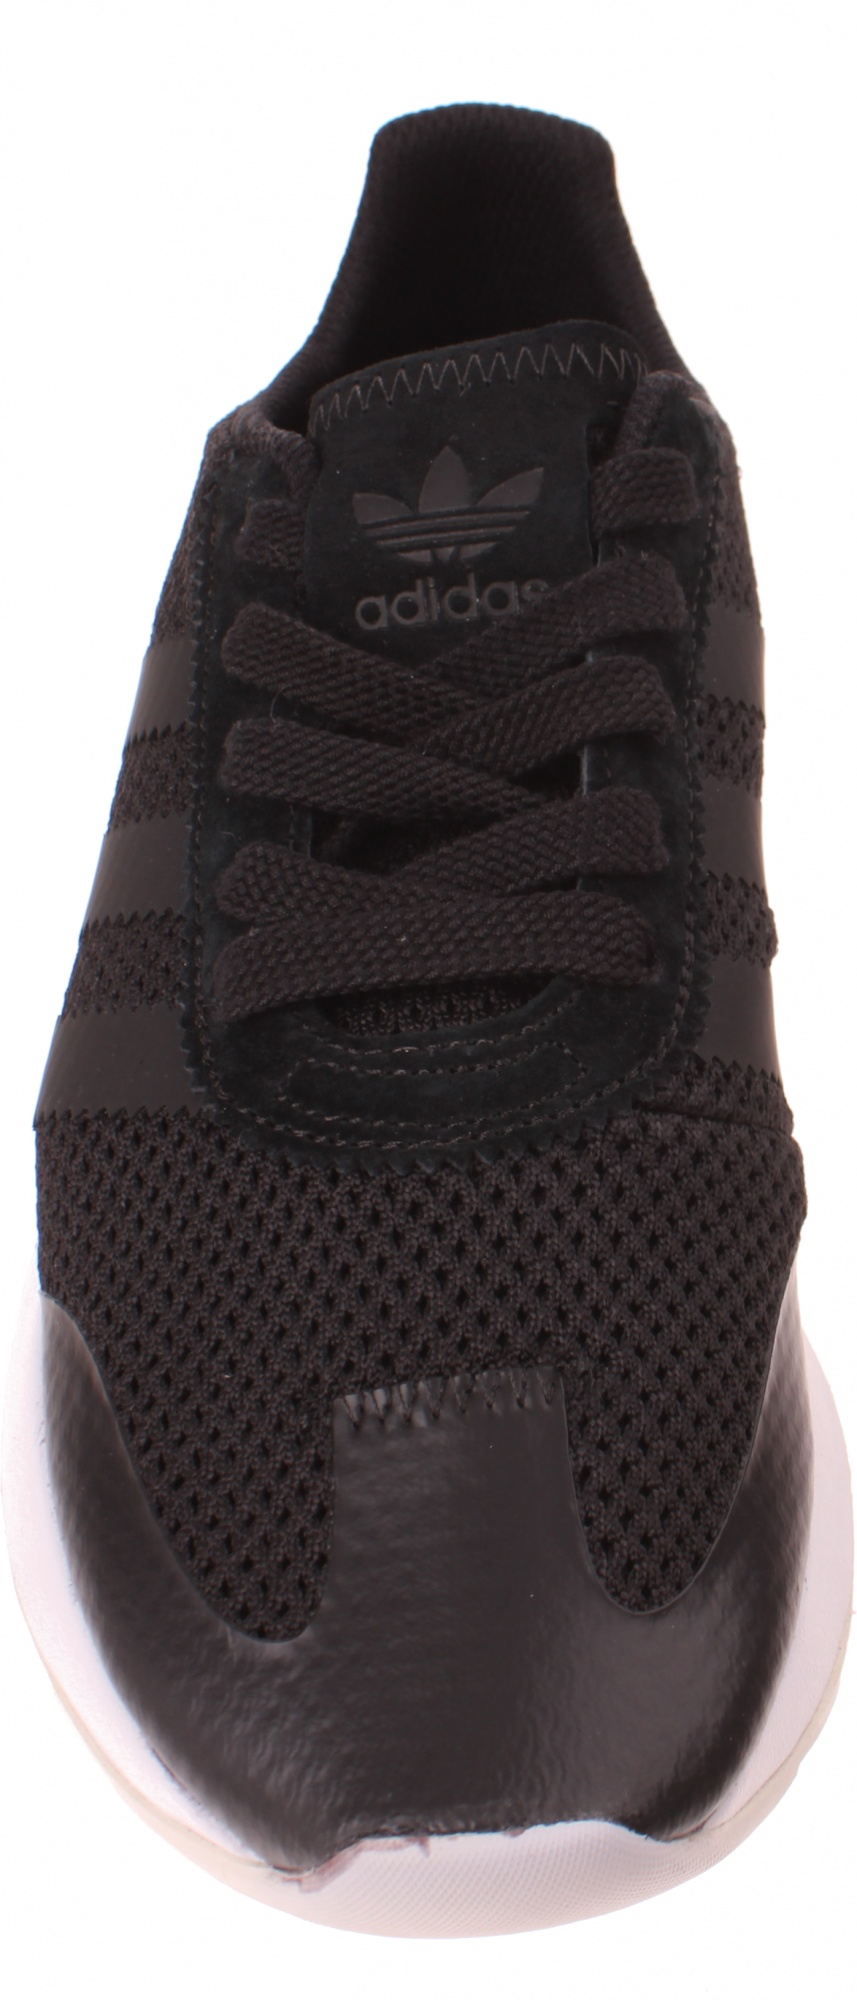 25d8ad98782 adidas sneakers Flashback dames zwart - Giga-Bikes Tilburg